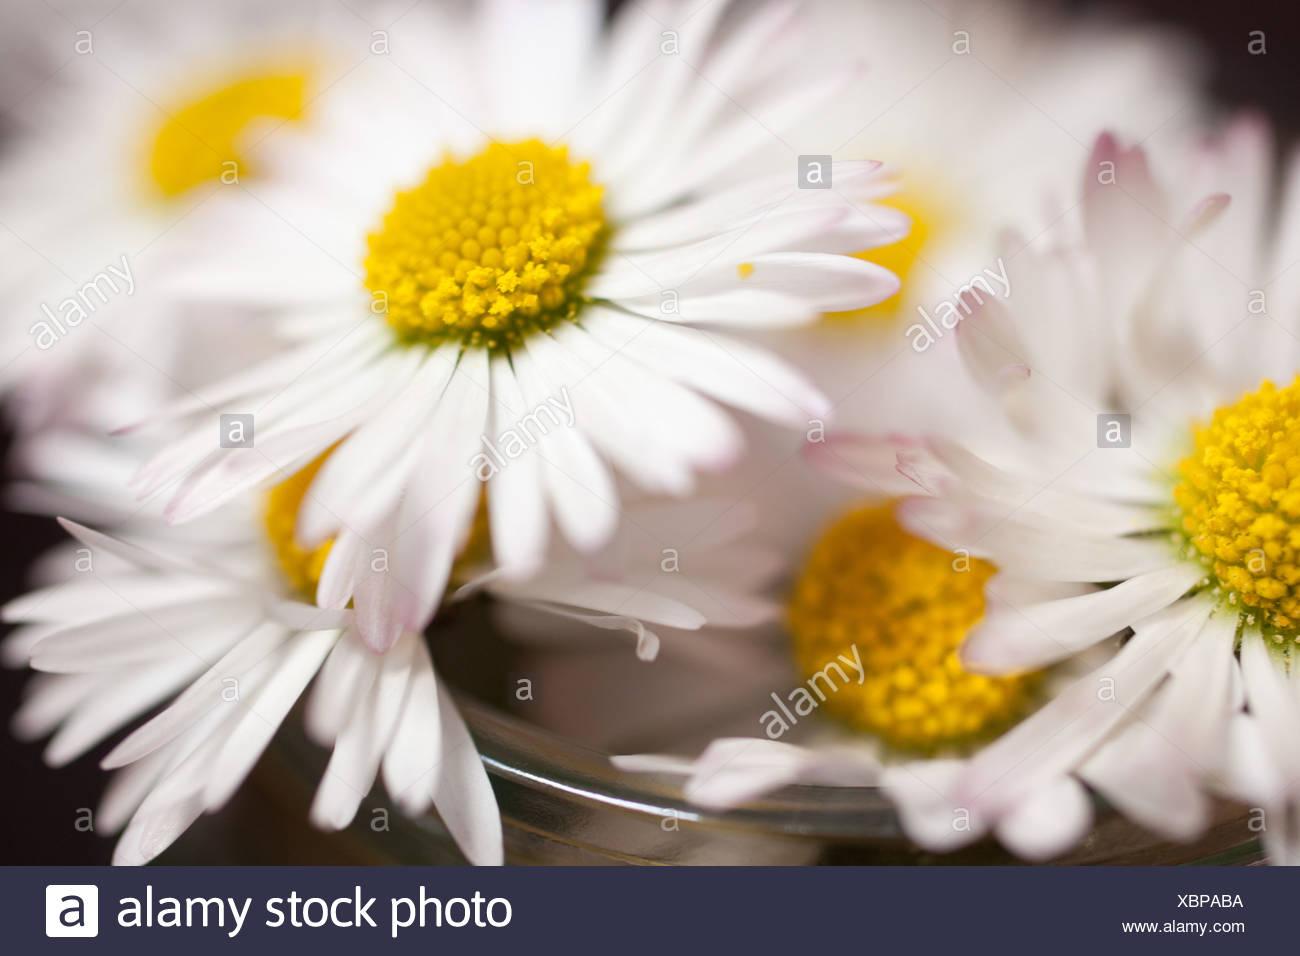 Daisies, close up - Stock Image